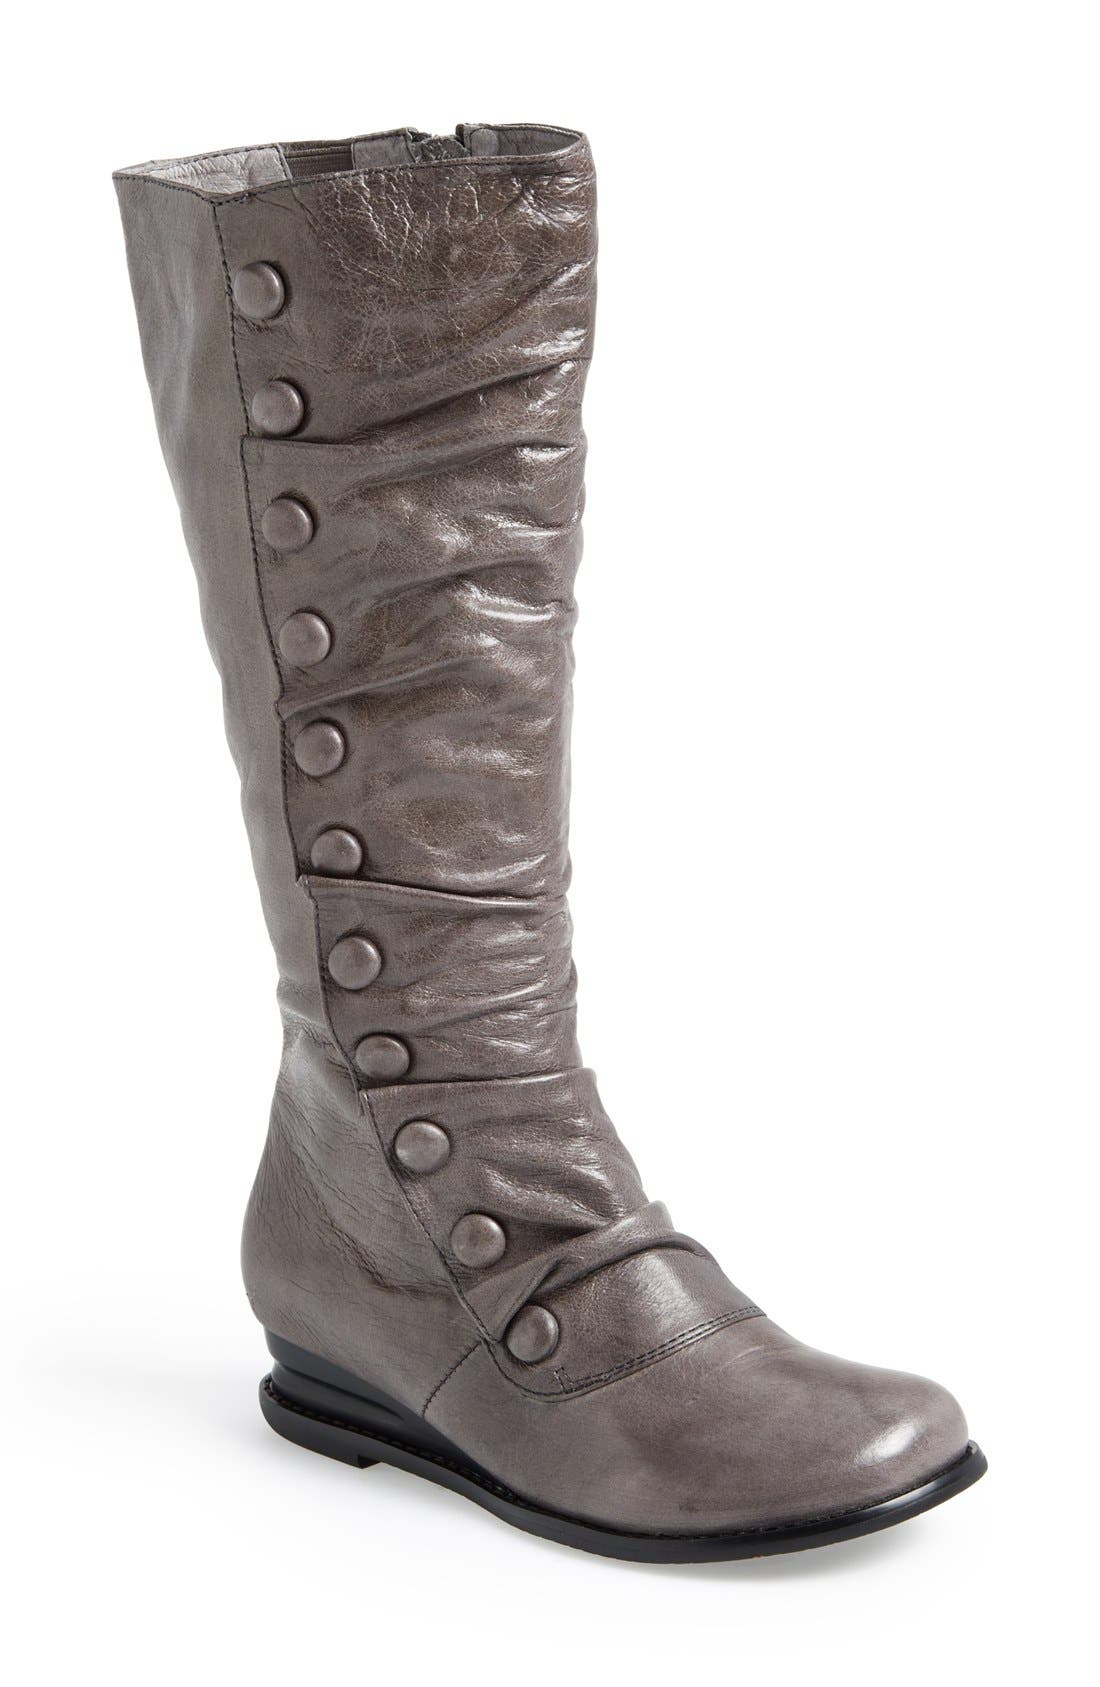 Main Image - Miz Mooz 'Bloom' Leather Boot (Women)(Wide Calf)